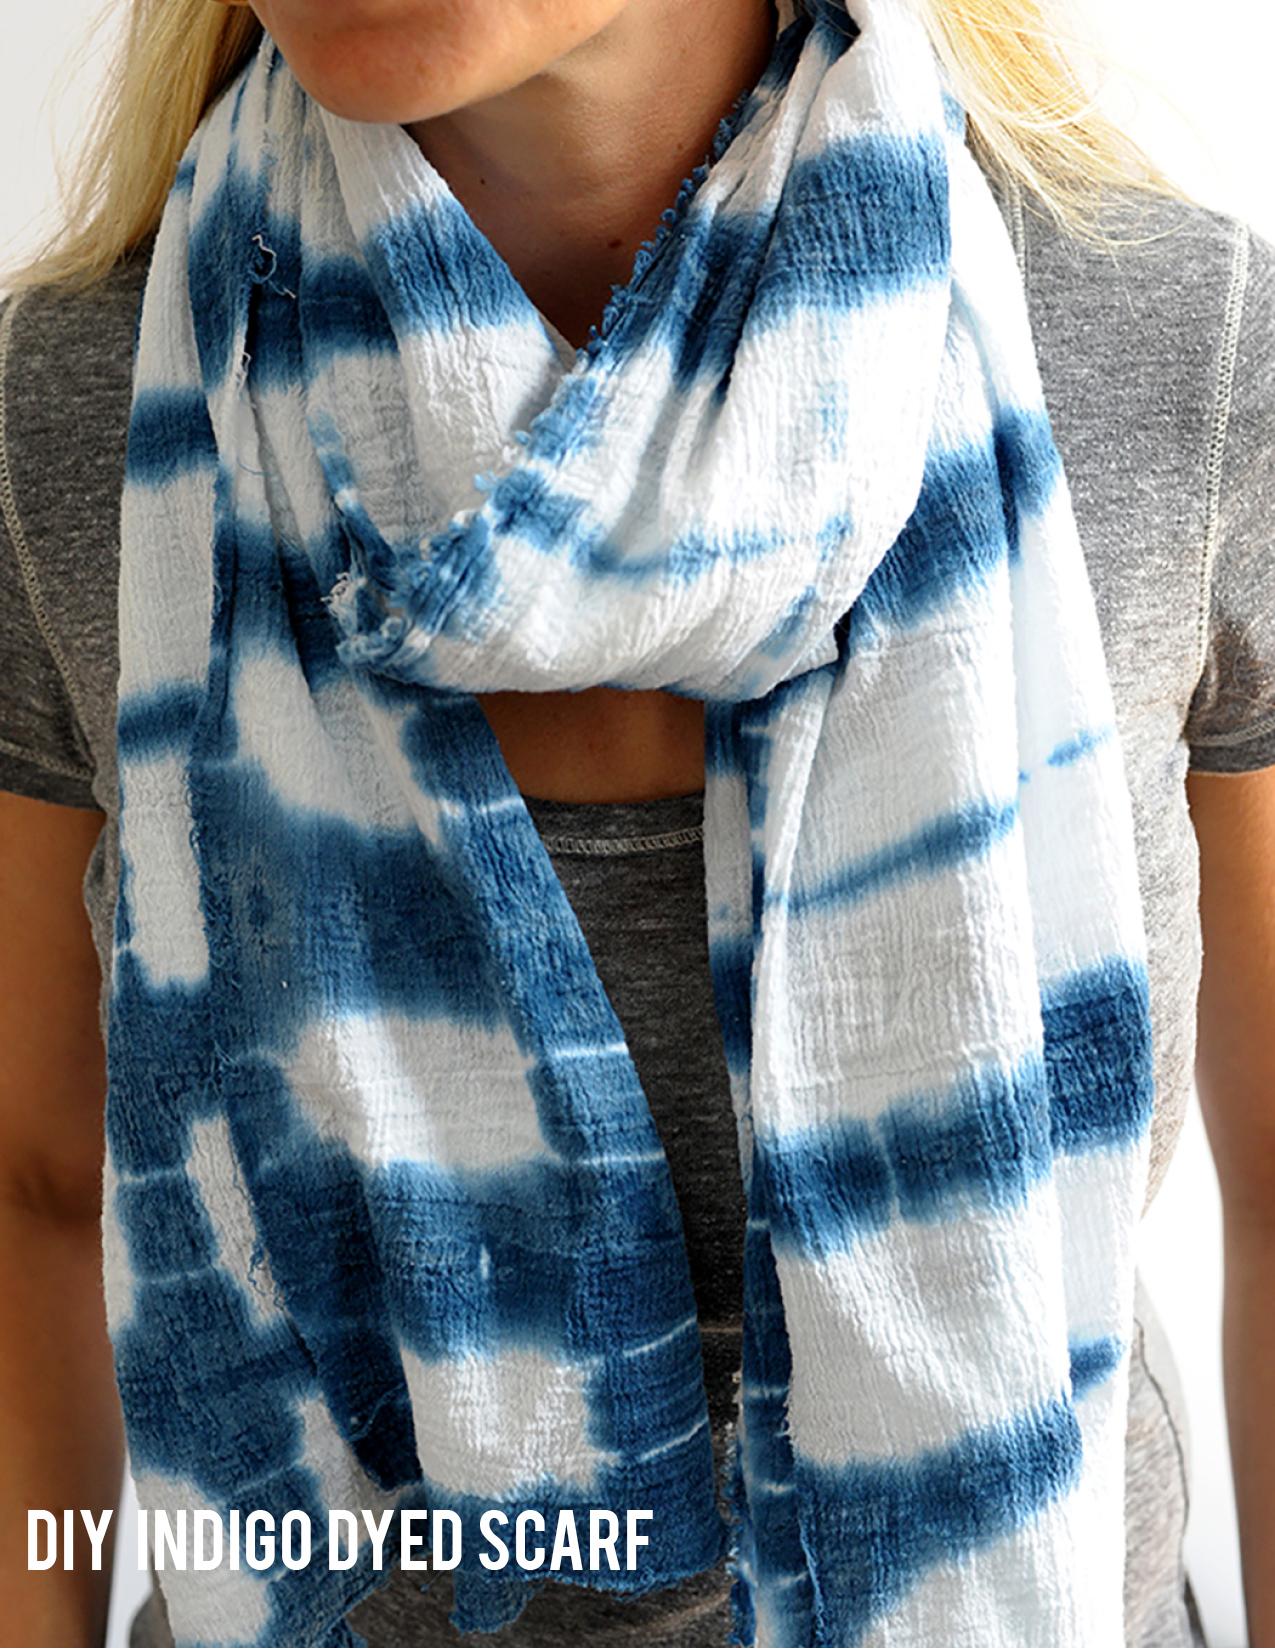 Indigo dyed scarf diy main